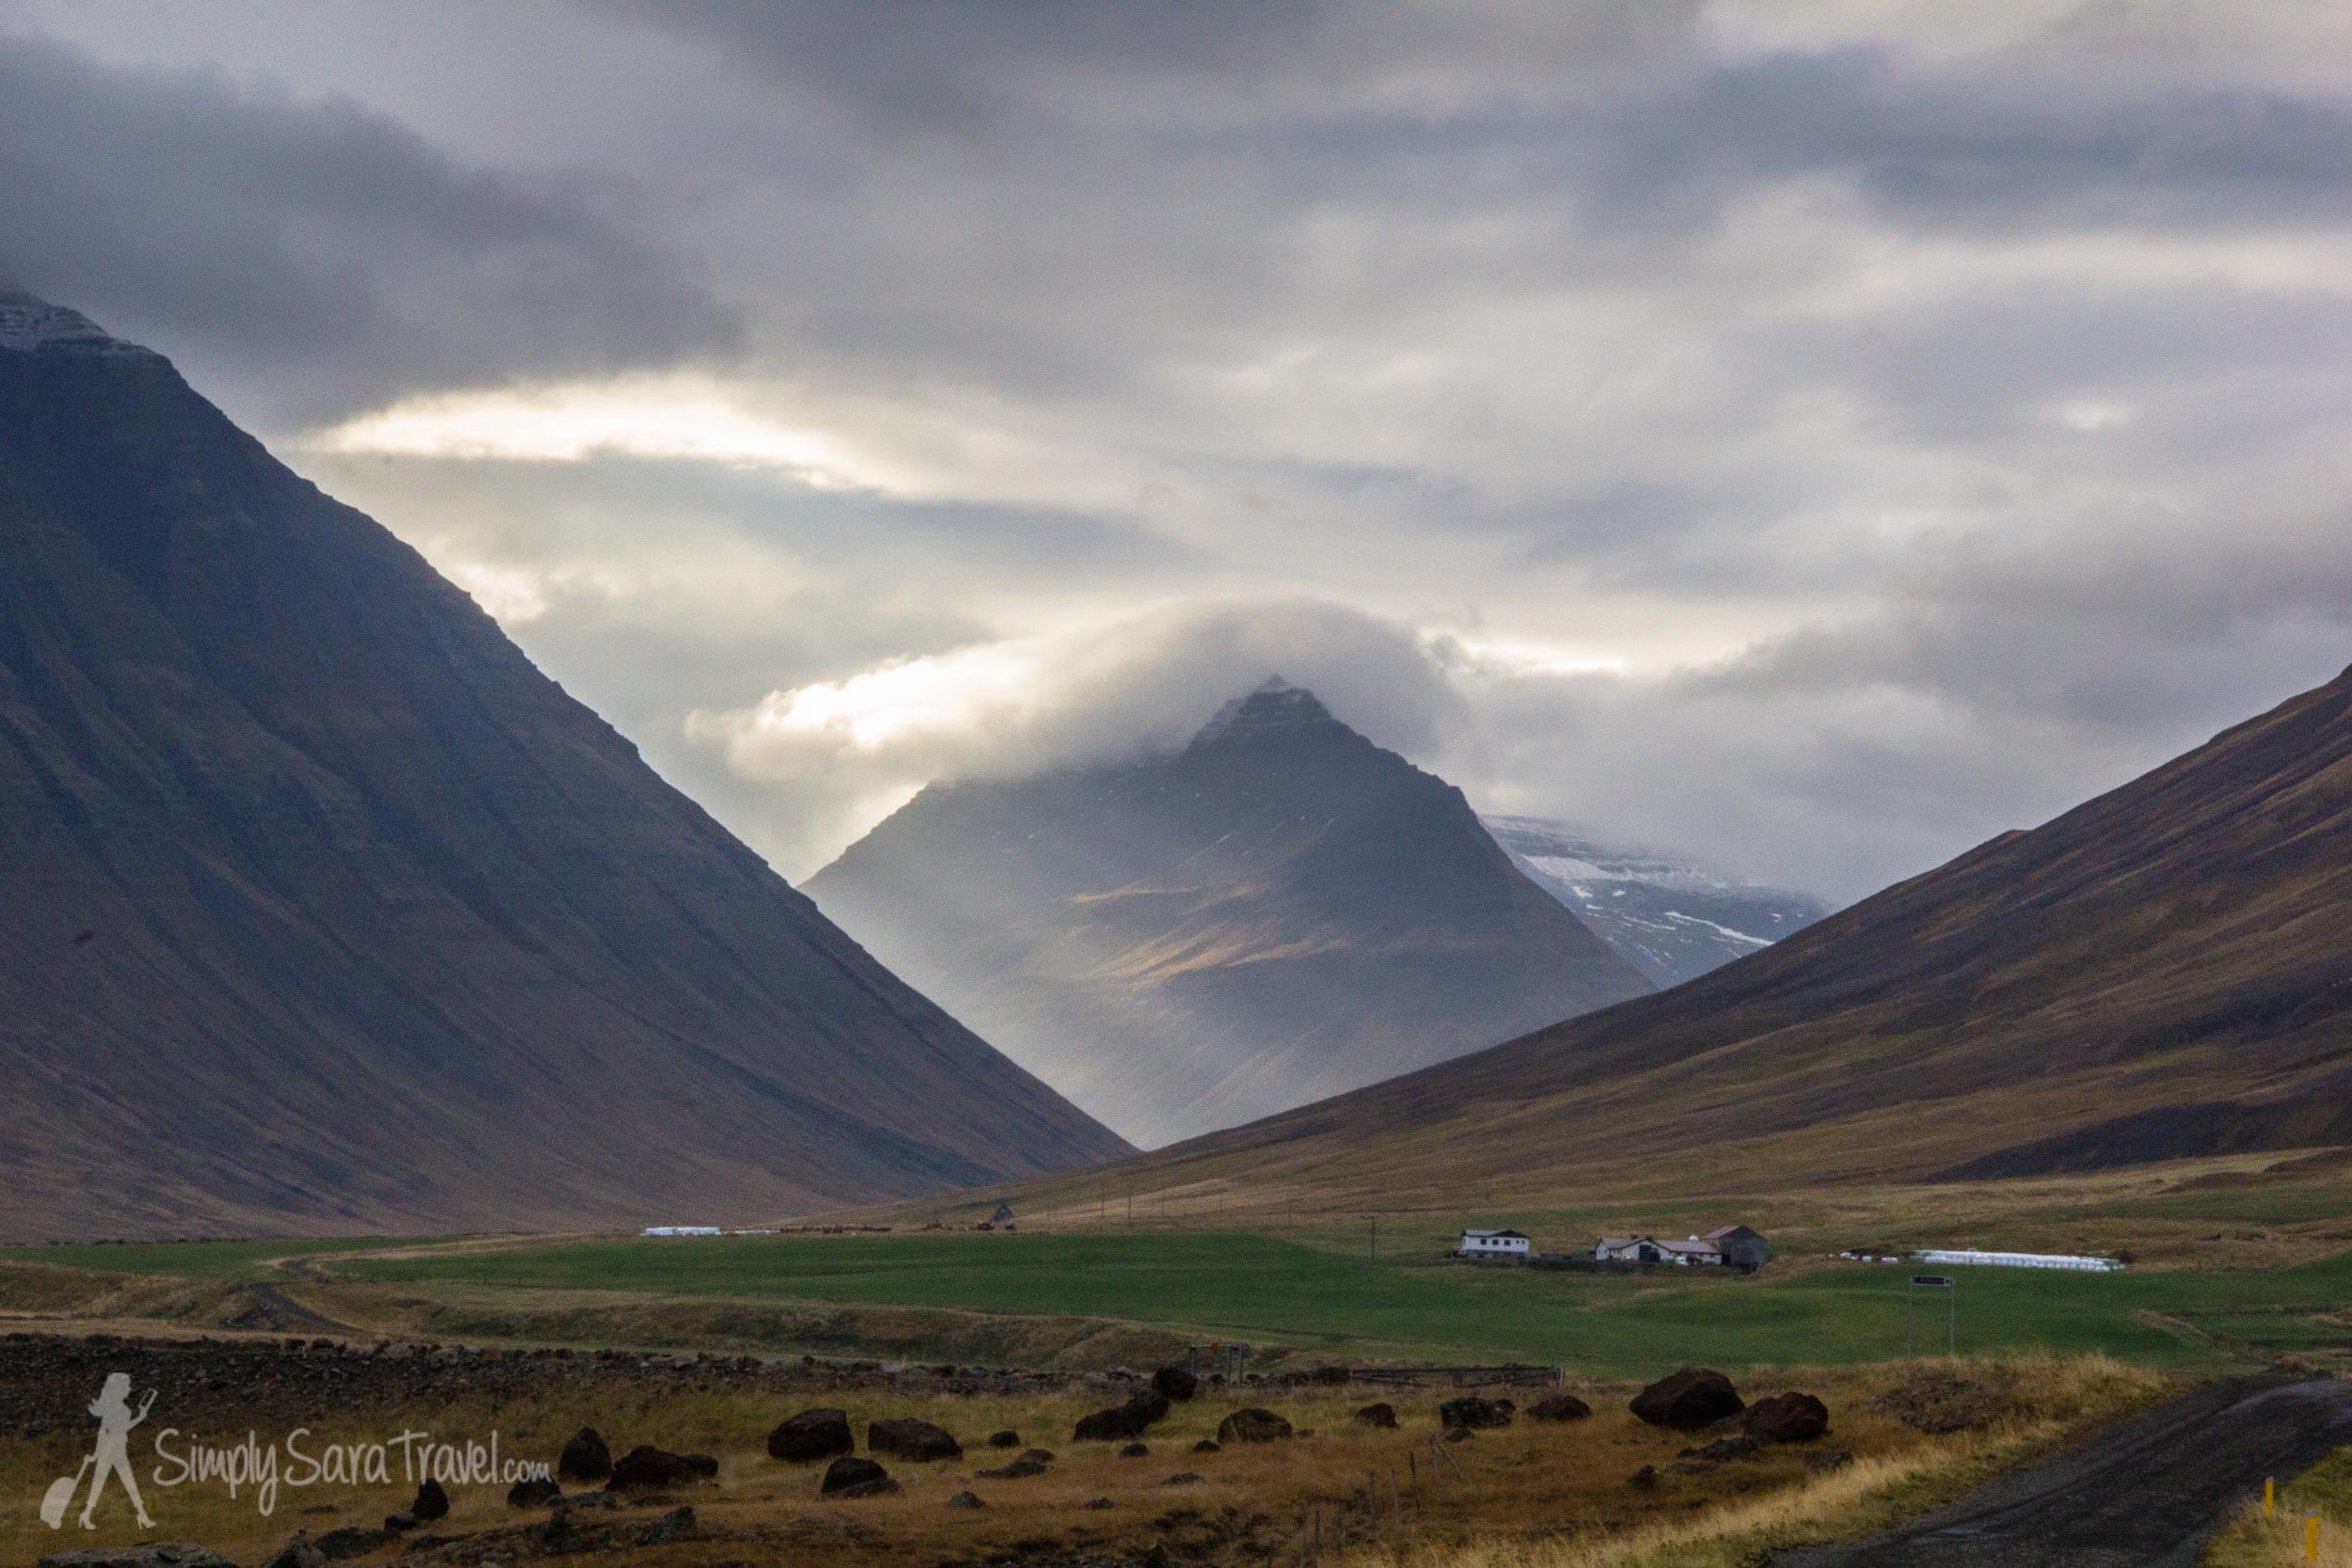 An Icelandic farm beneath the mountains.